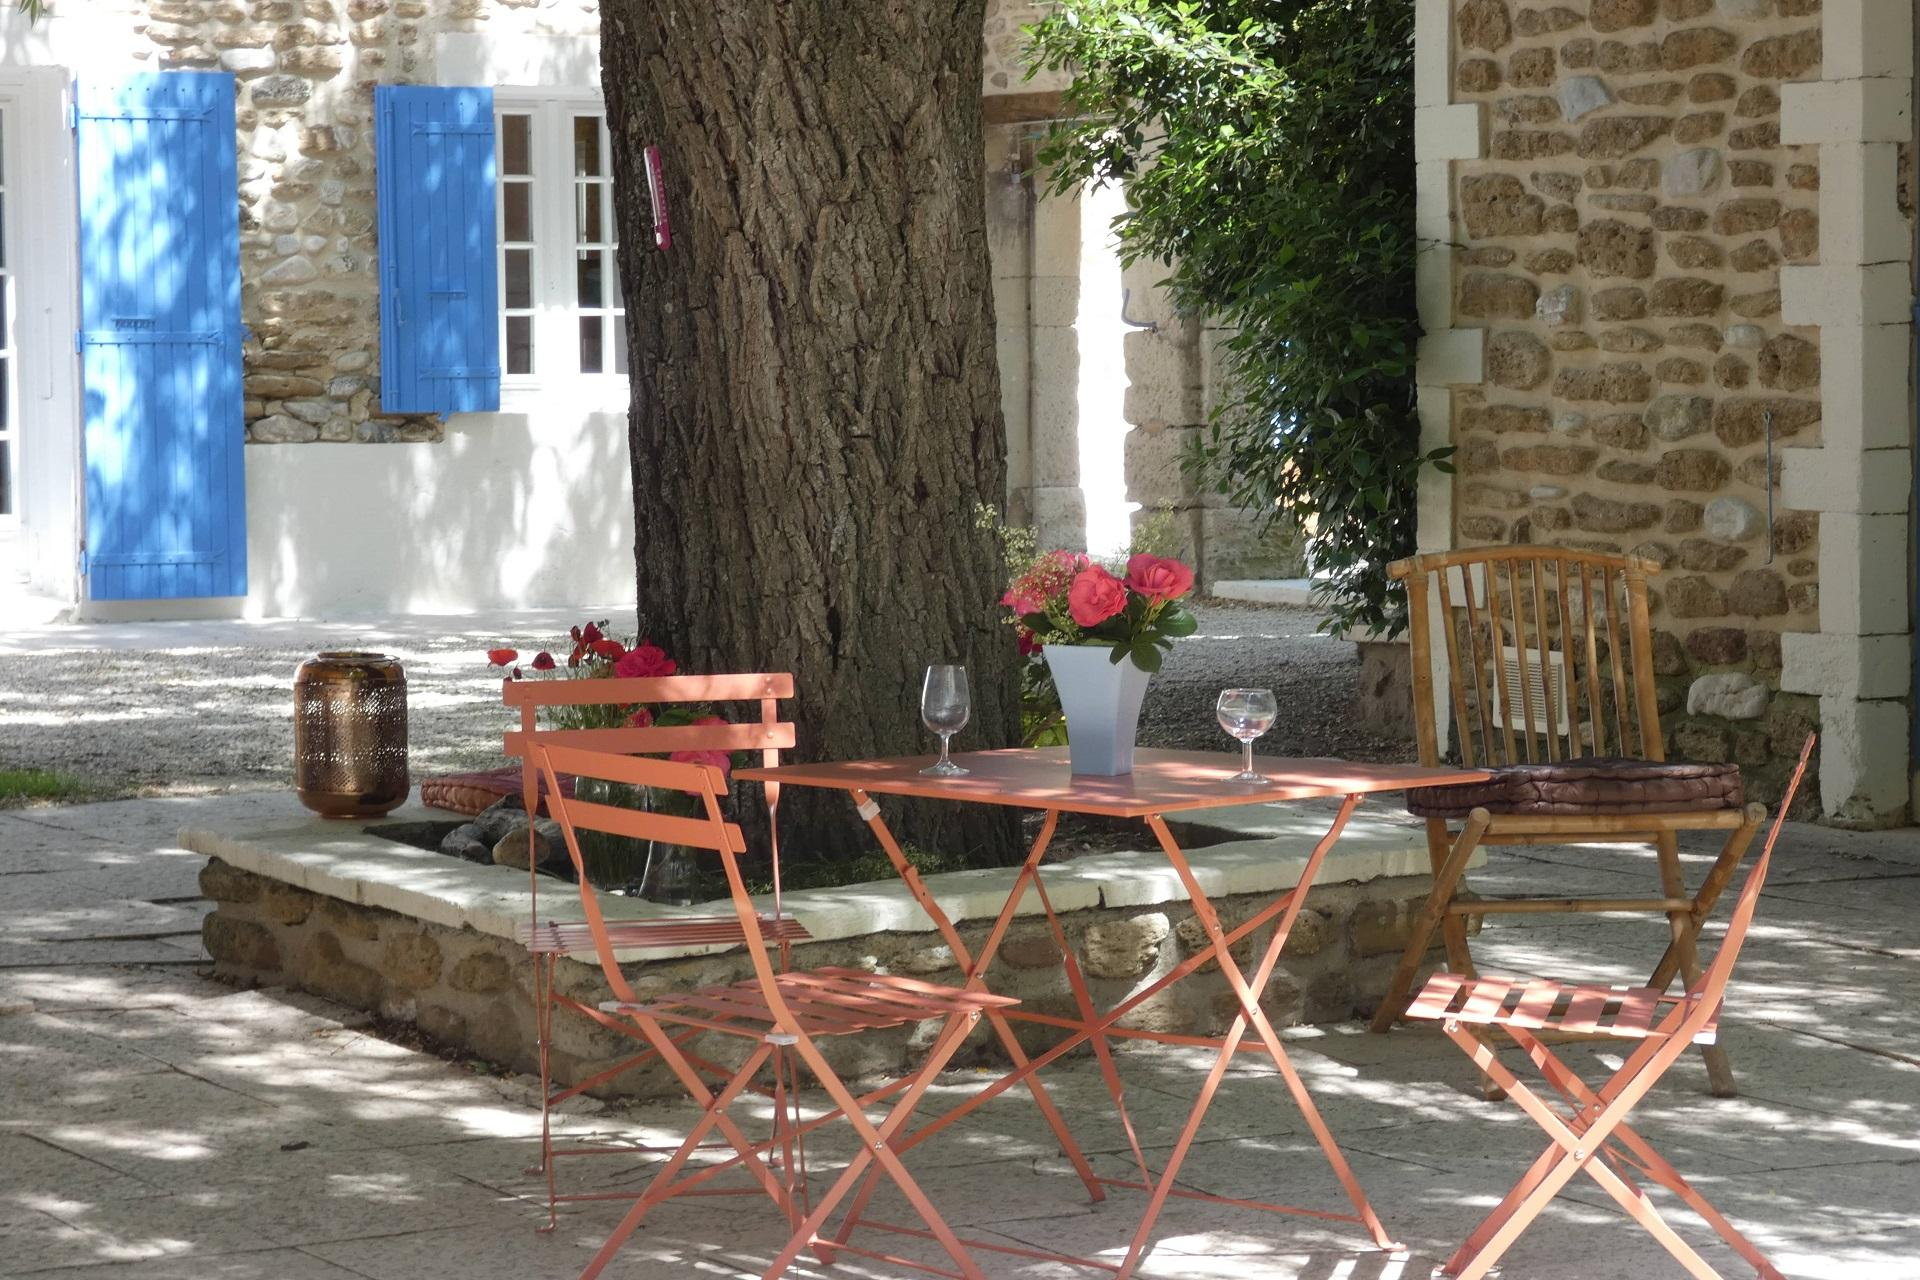 mas-du-sillot-grignan-vaucluse-drome-aperitif-seminaire-de-caractere